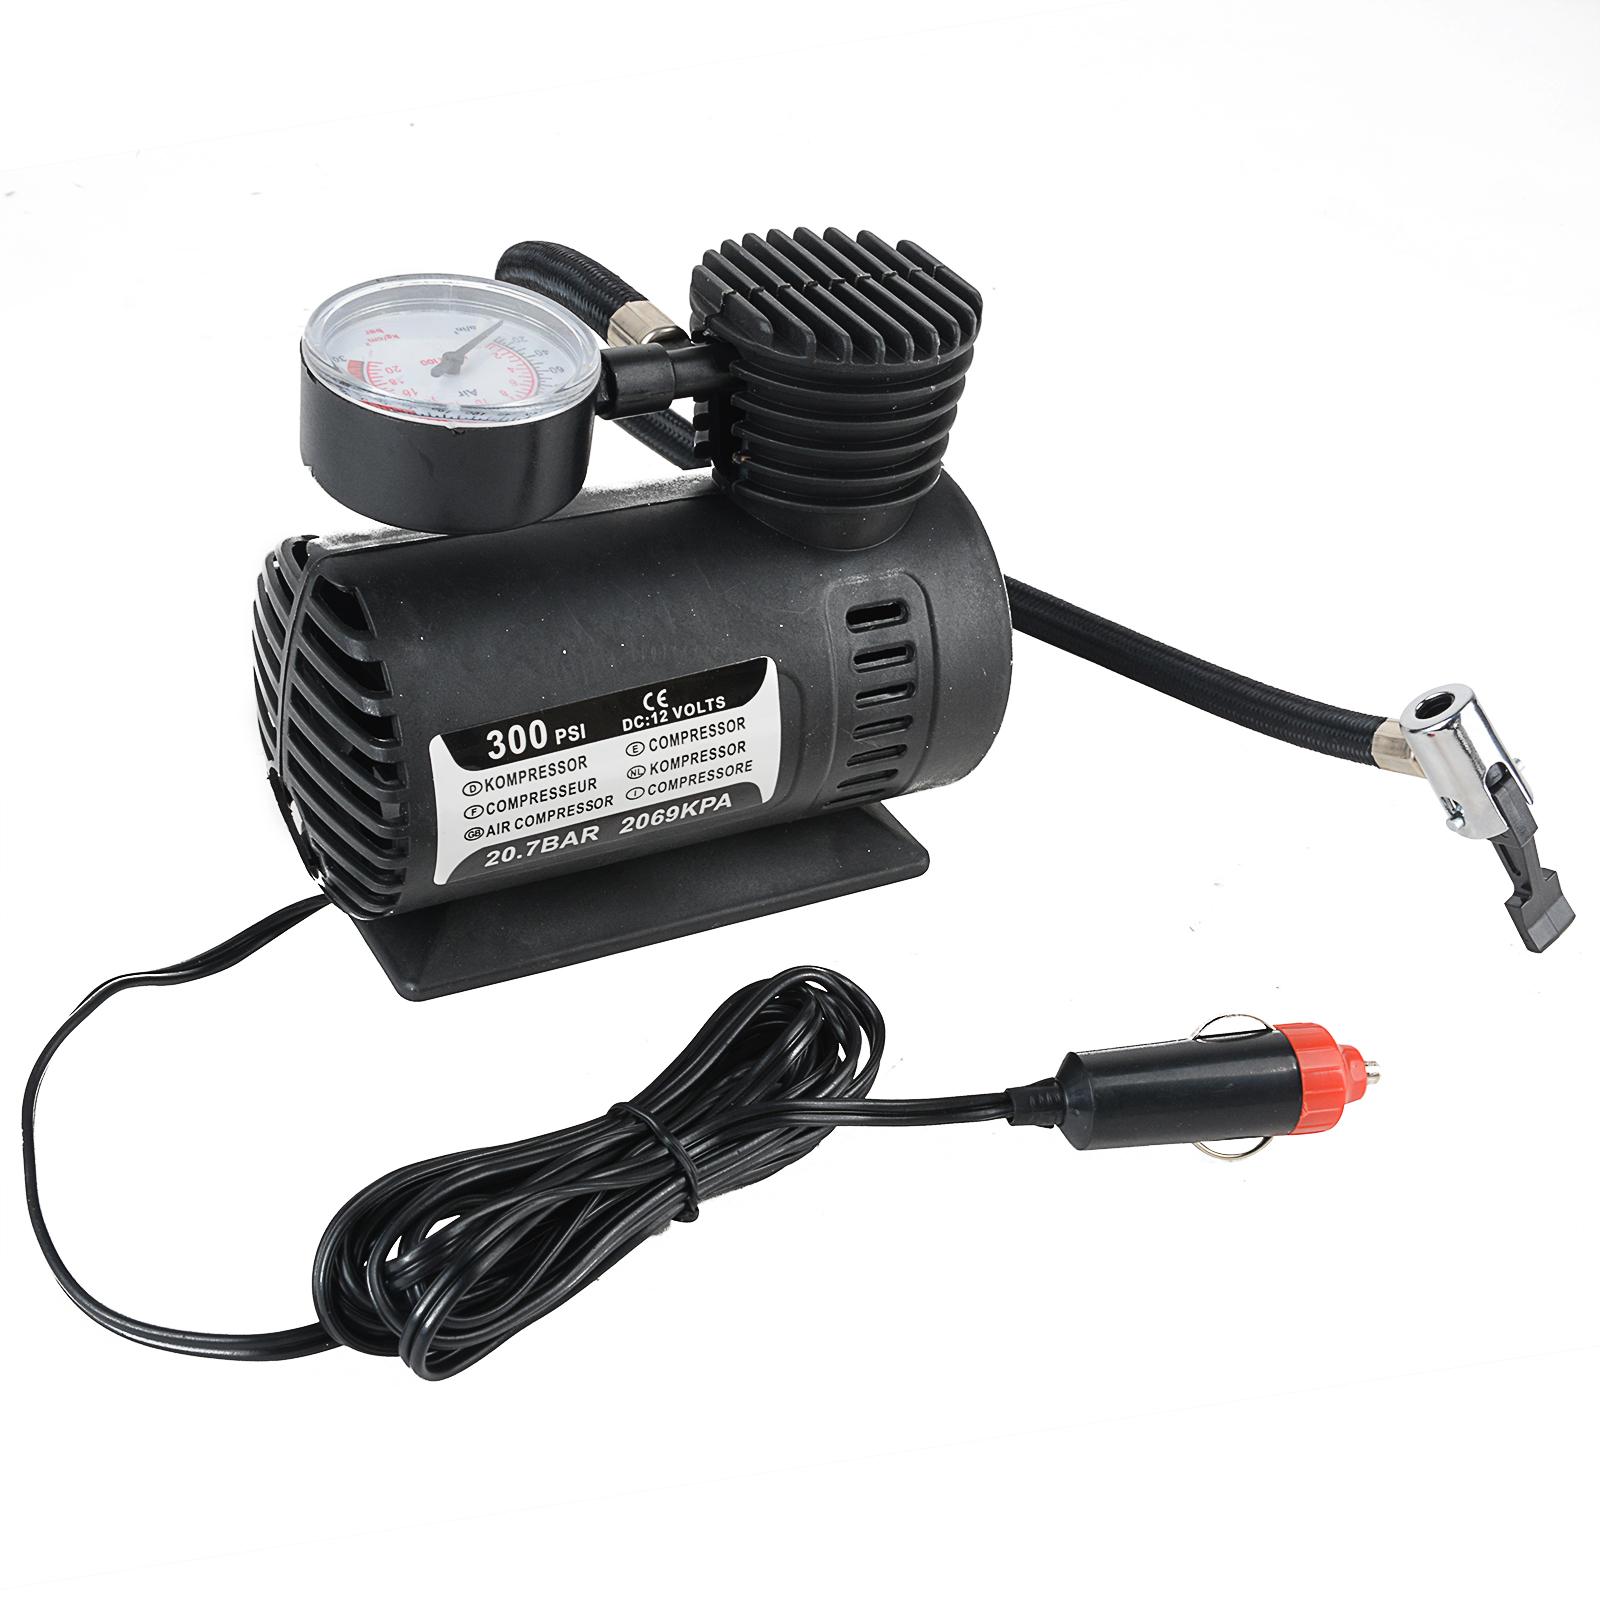 Compresor de aire BN1515